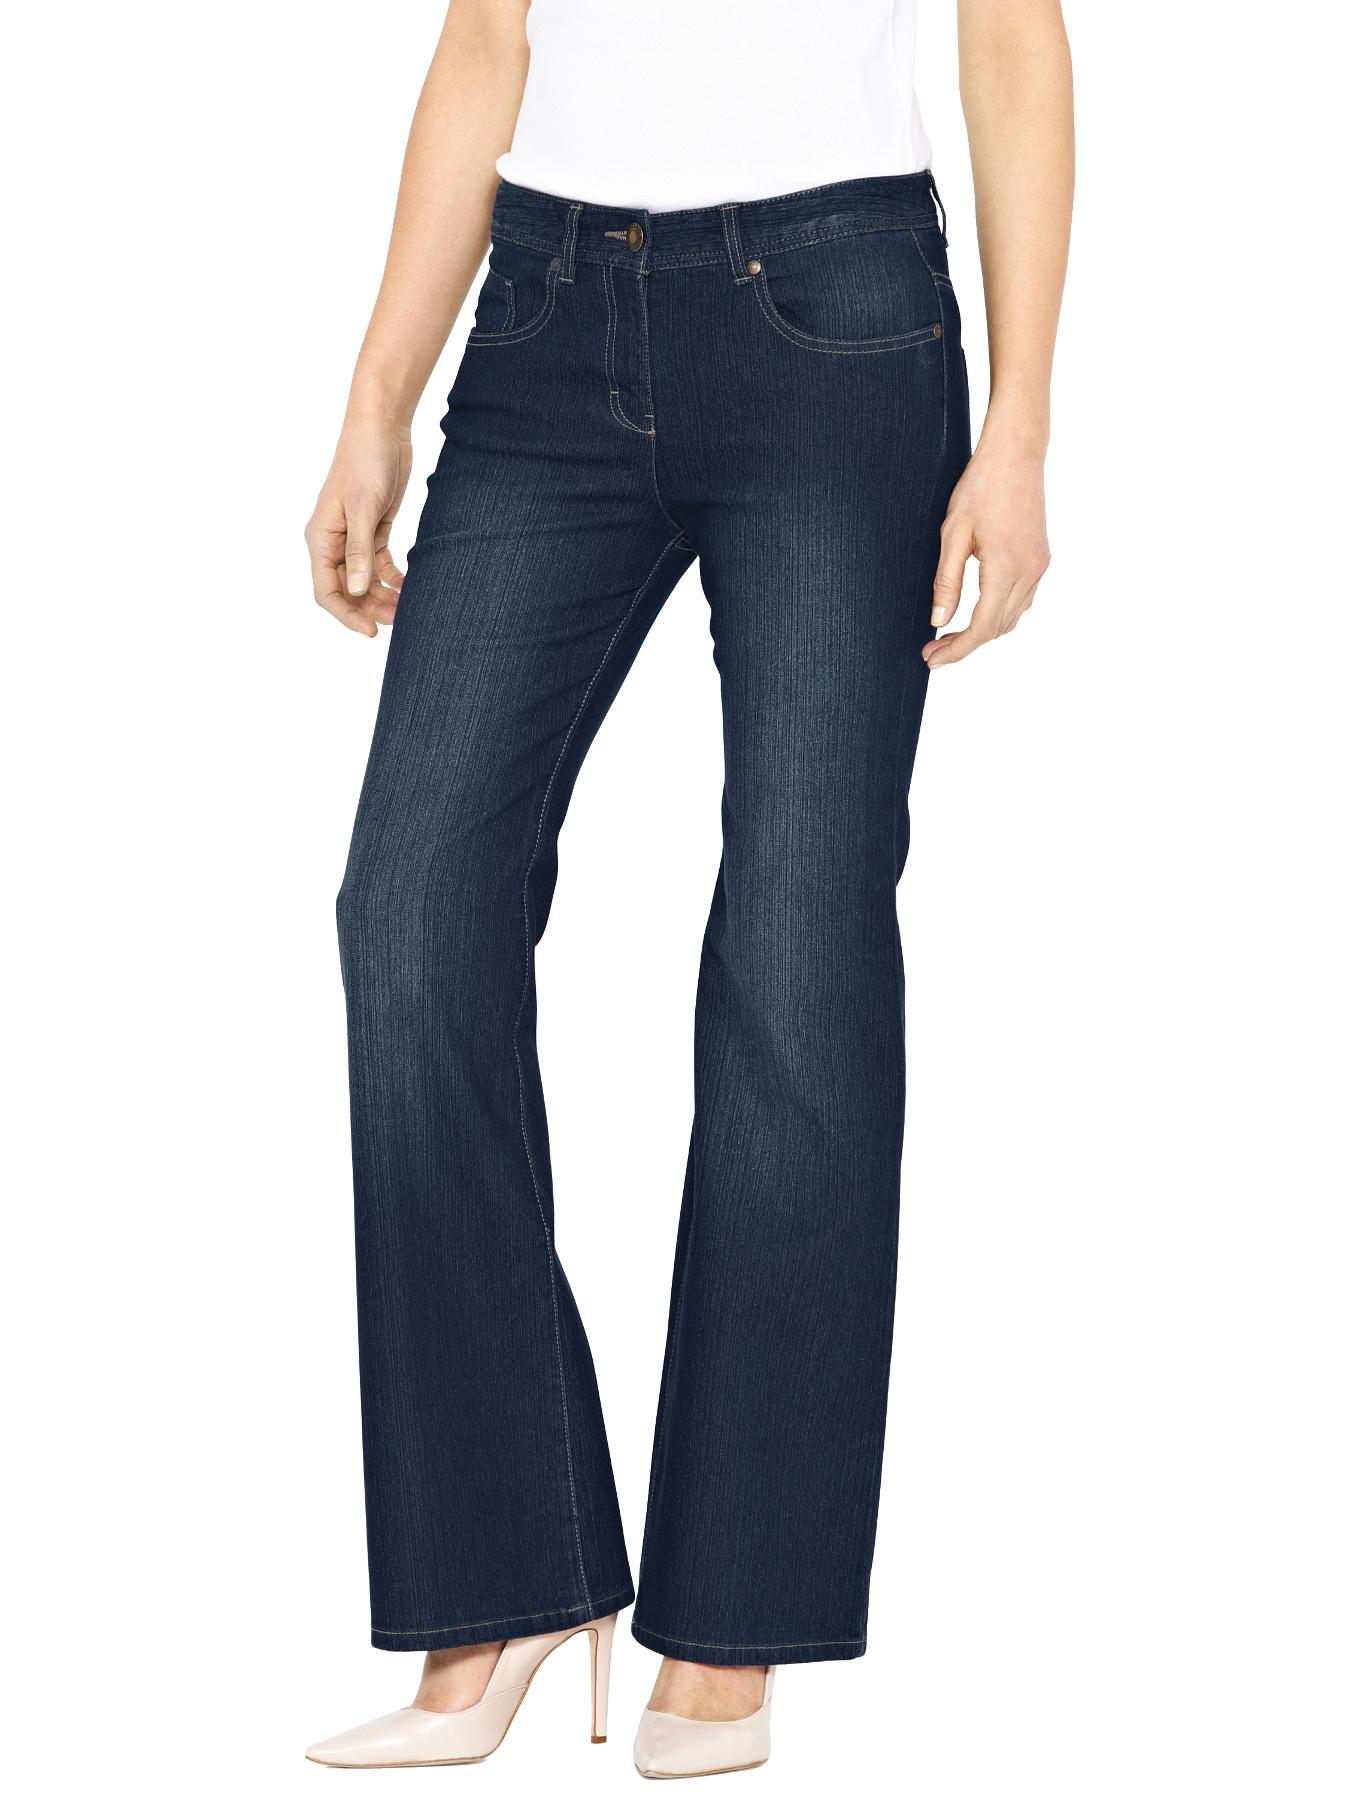 Petite Bootcut Jeans, Black,Indigo